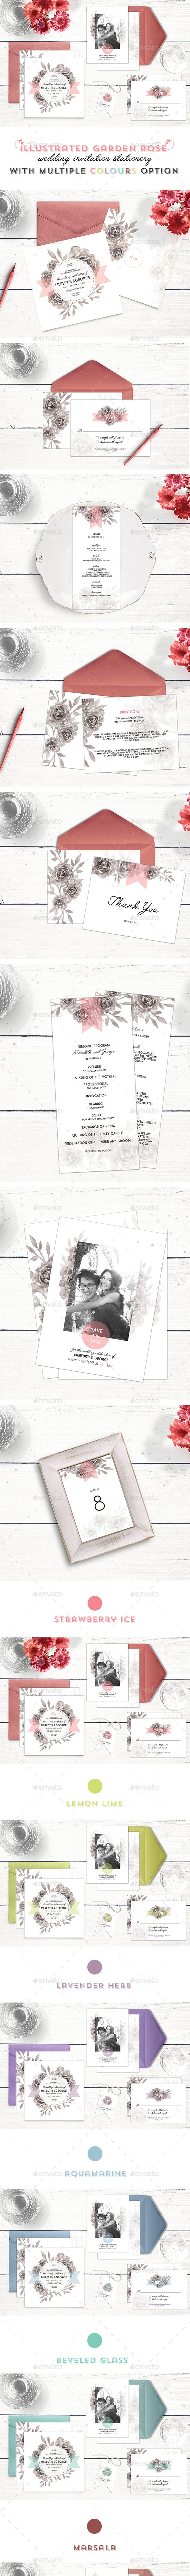 Wedding Invitation Stationery - Rose Garden - Weddings Cards & Invites